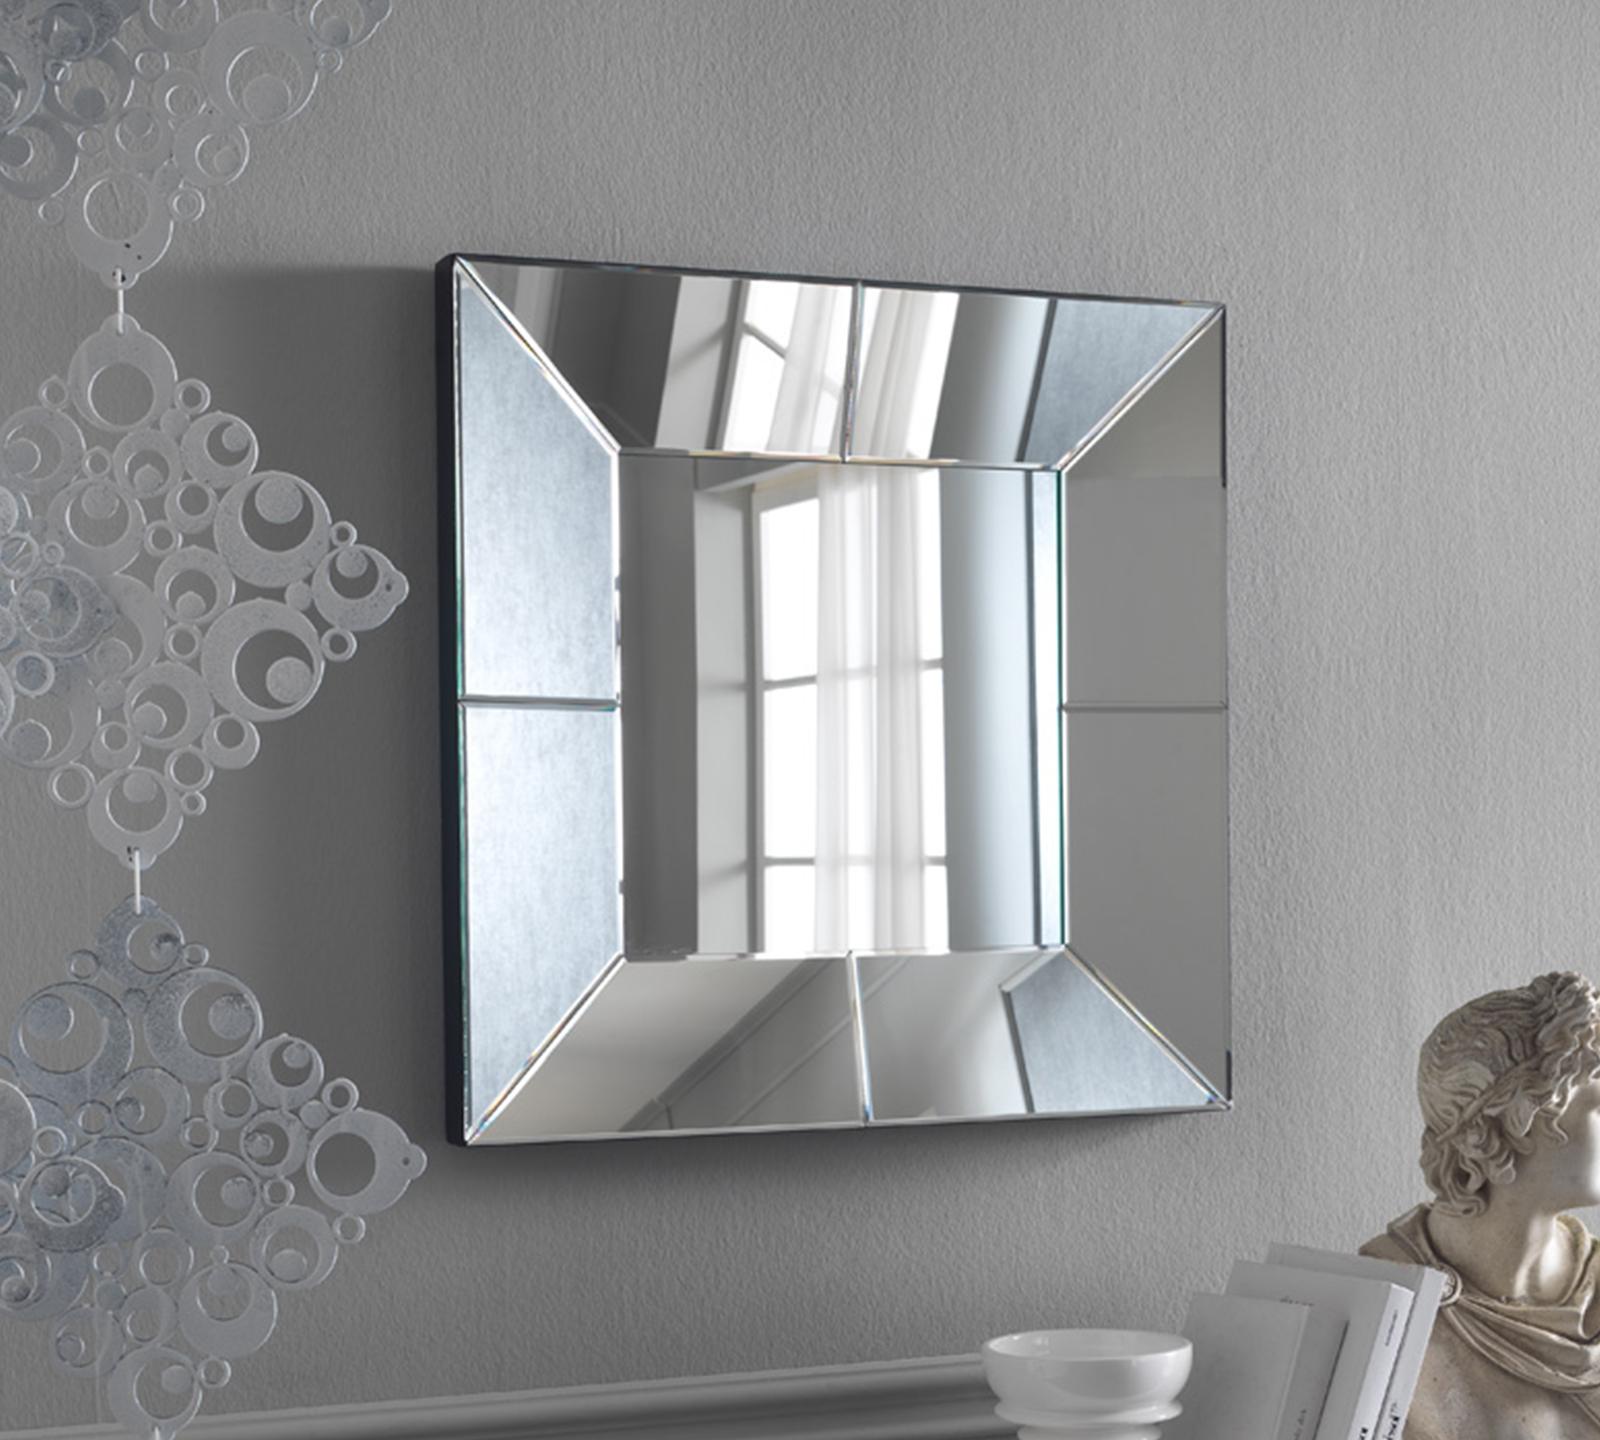 Specchio sp 017 duzzle - Specchi particolari per bagno ...